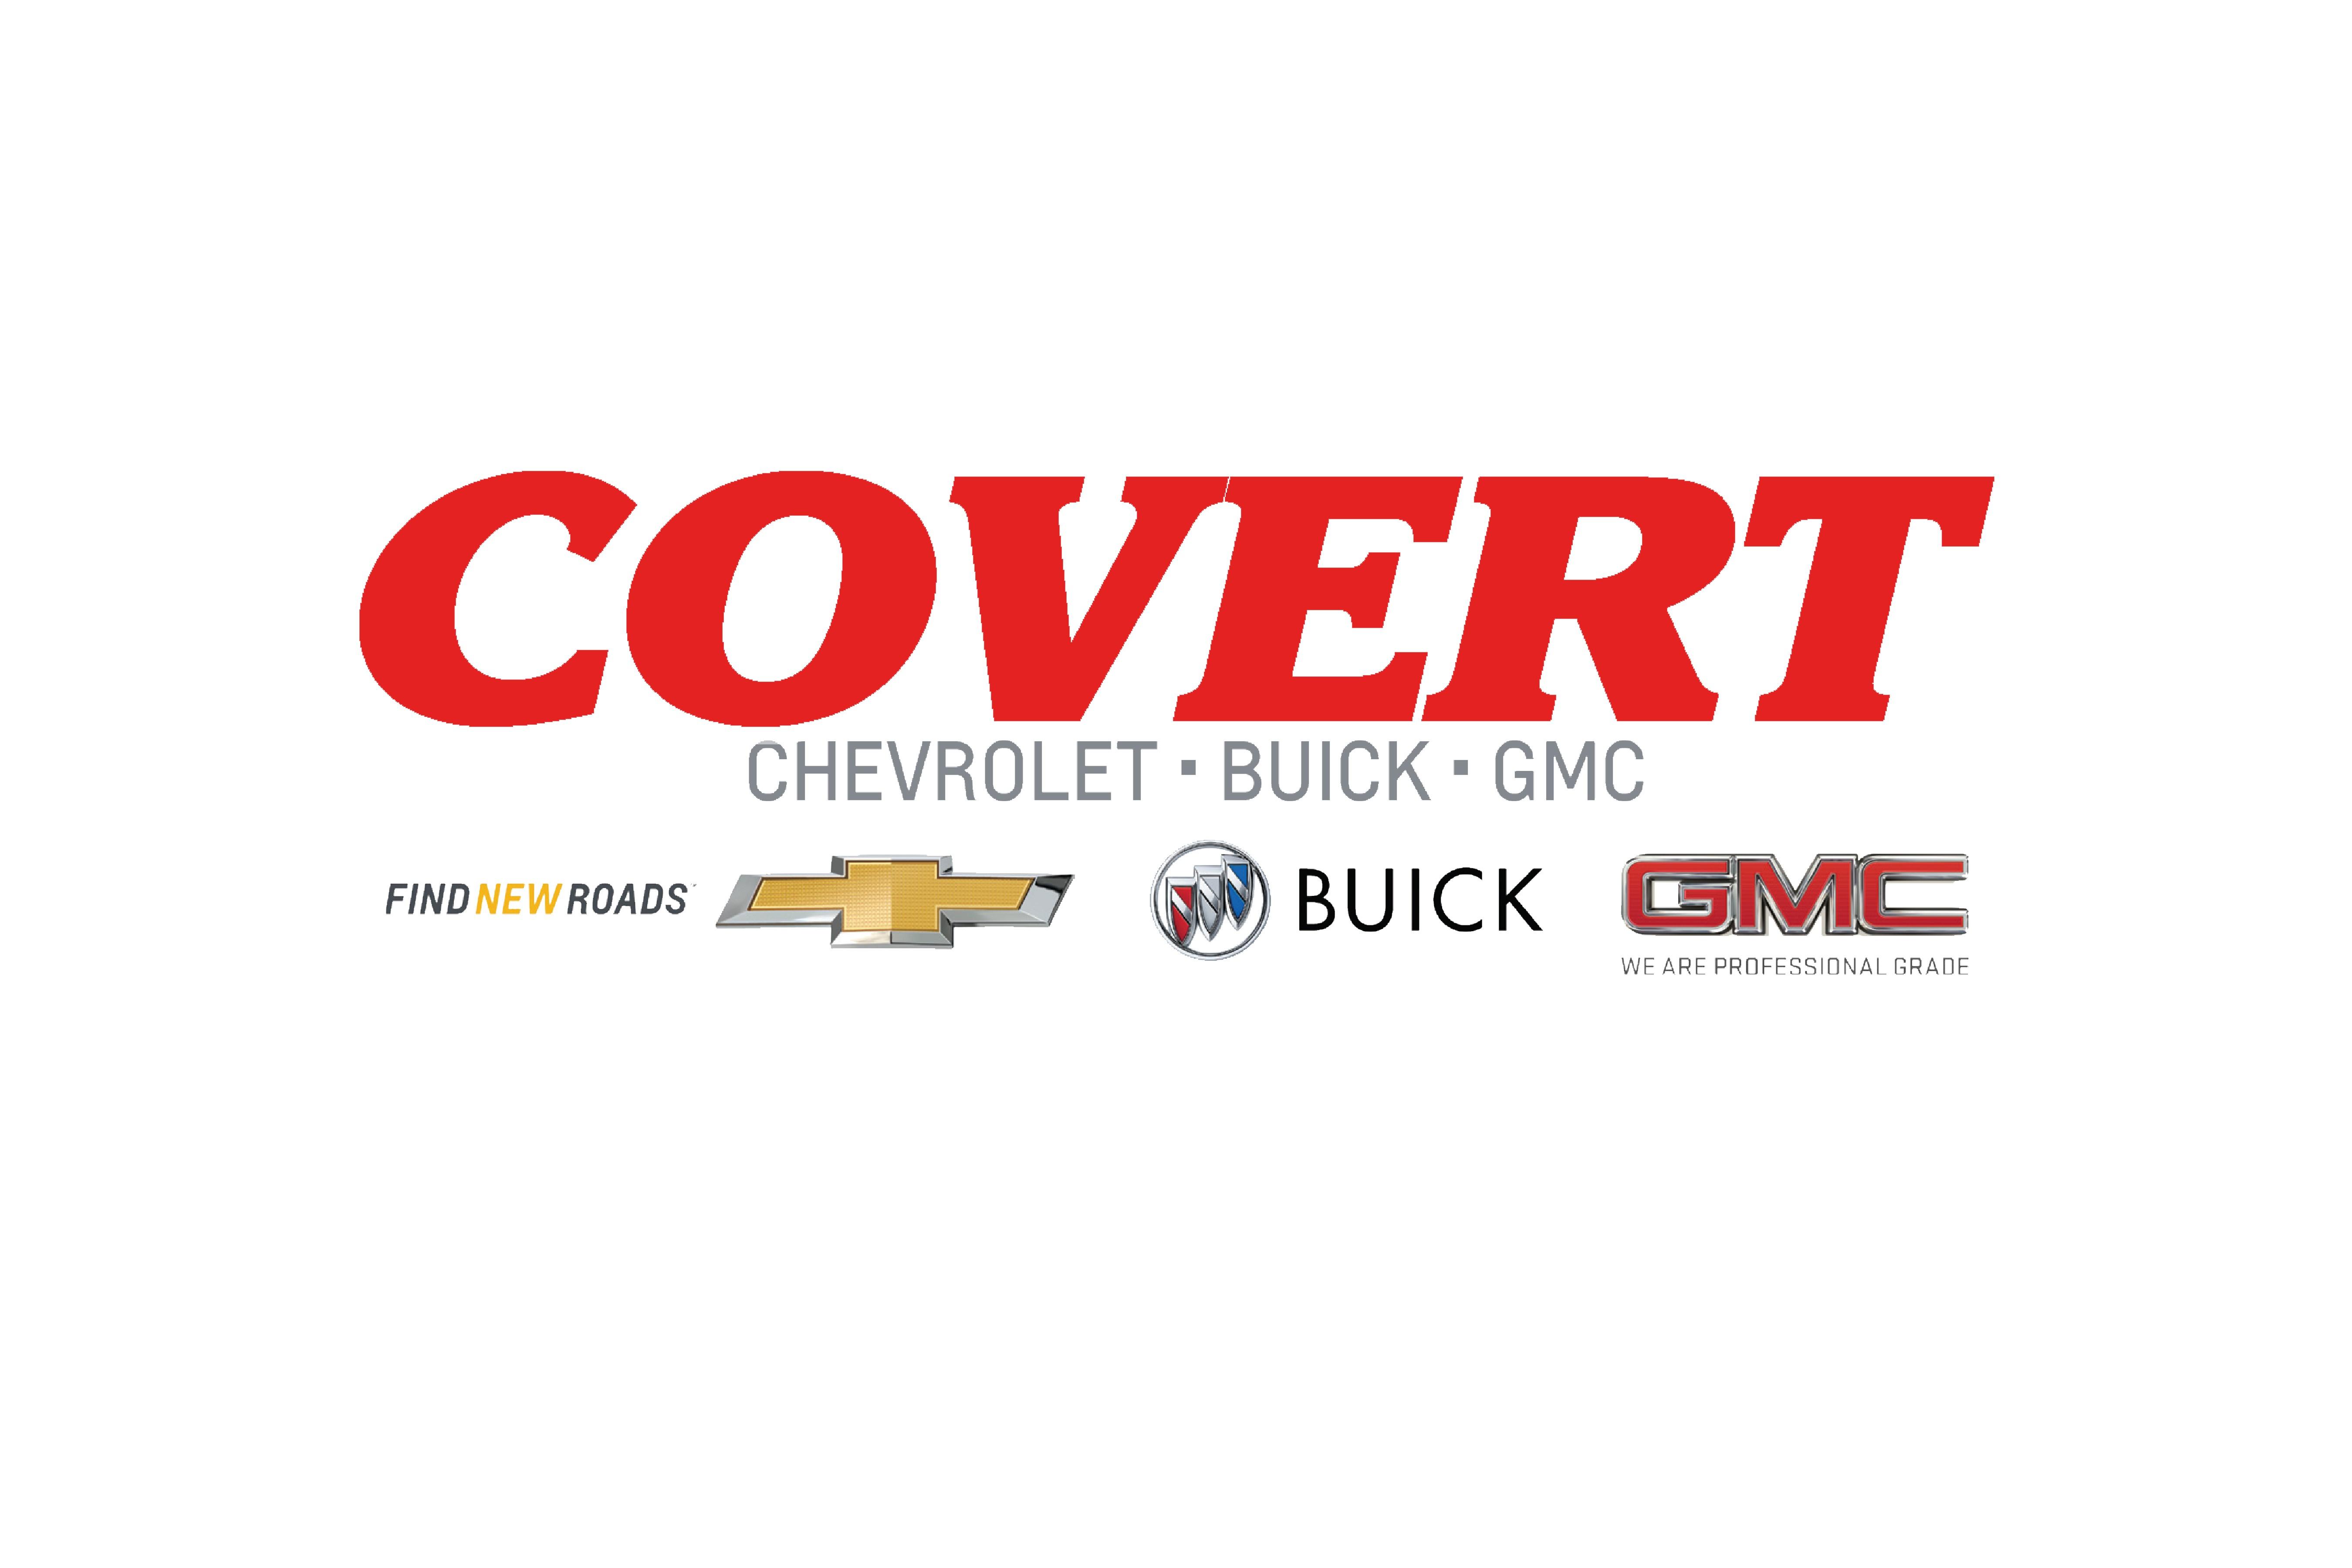 Covert Chevrolet Buick GMC Bastrop logo